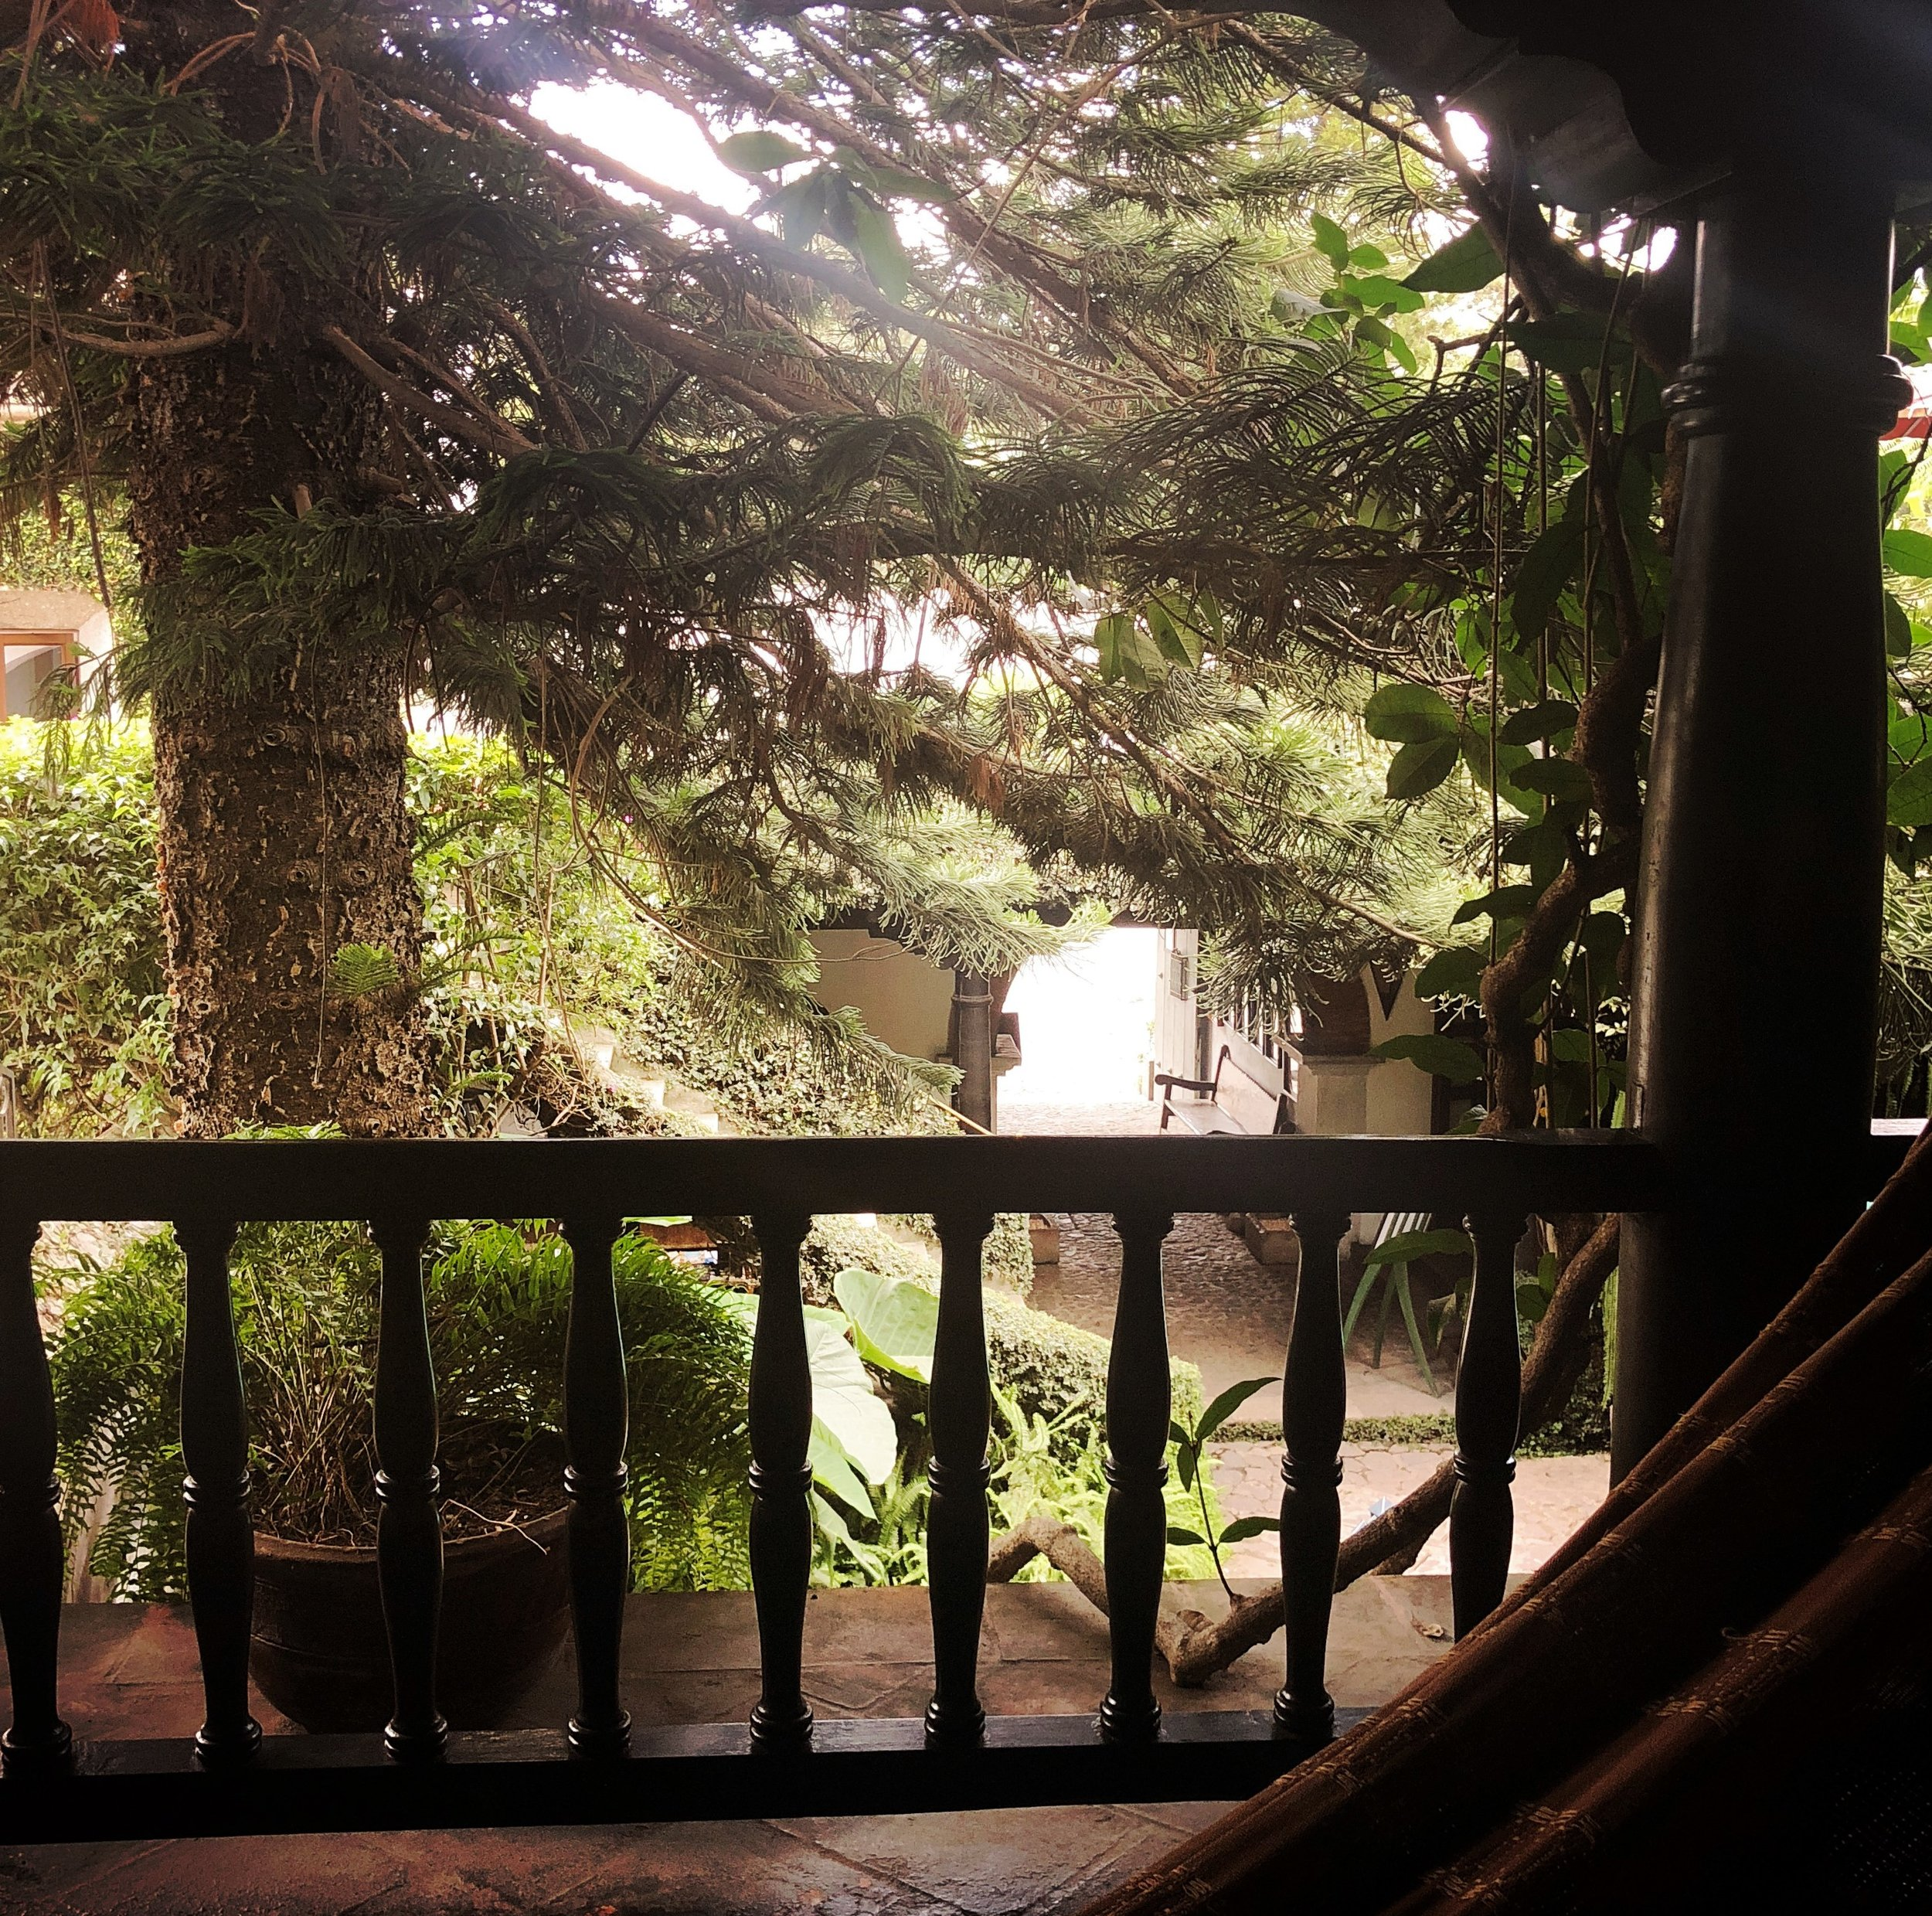 Open Air Places - Meson Panza Verde 6.19.jpg